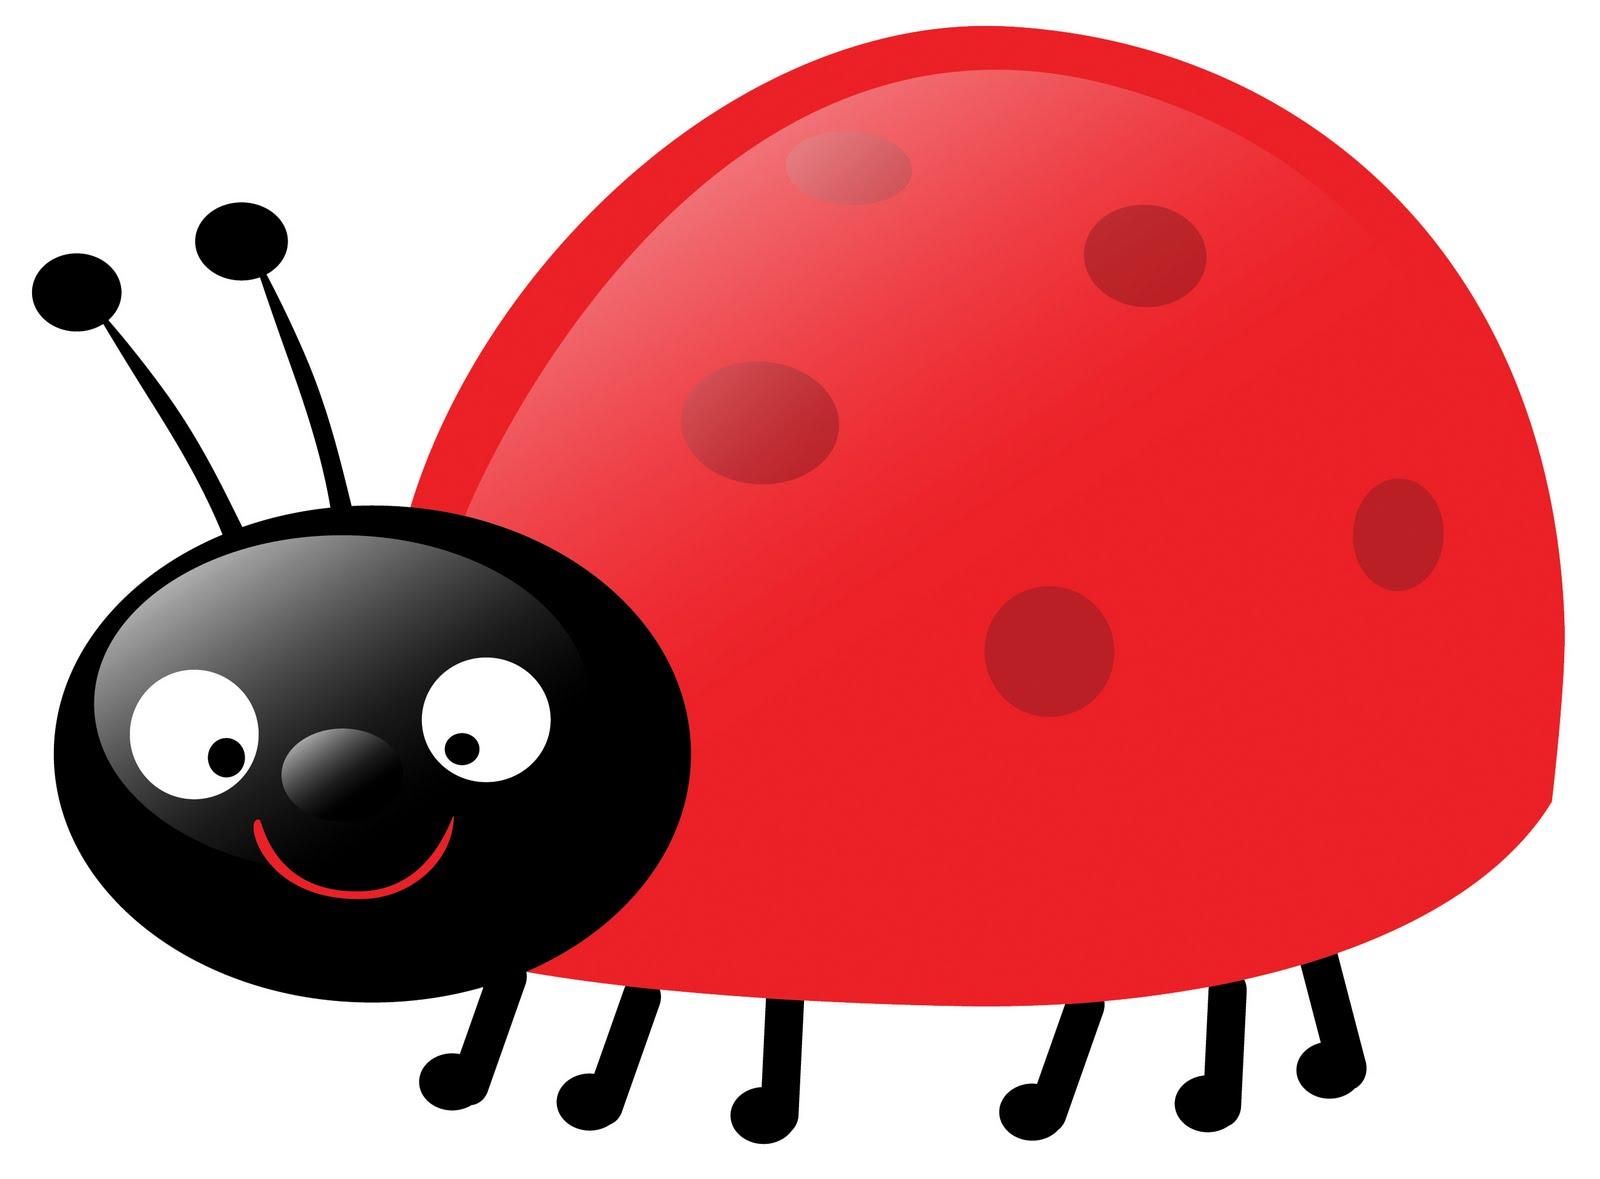 clip art of a ladybug - photo #1